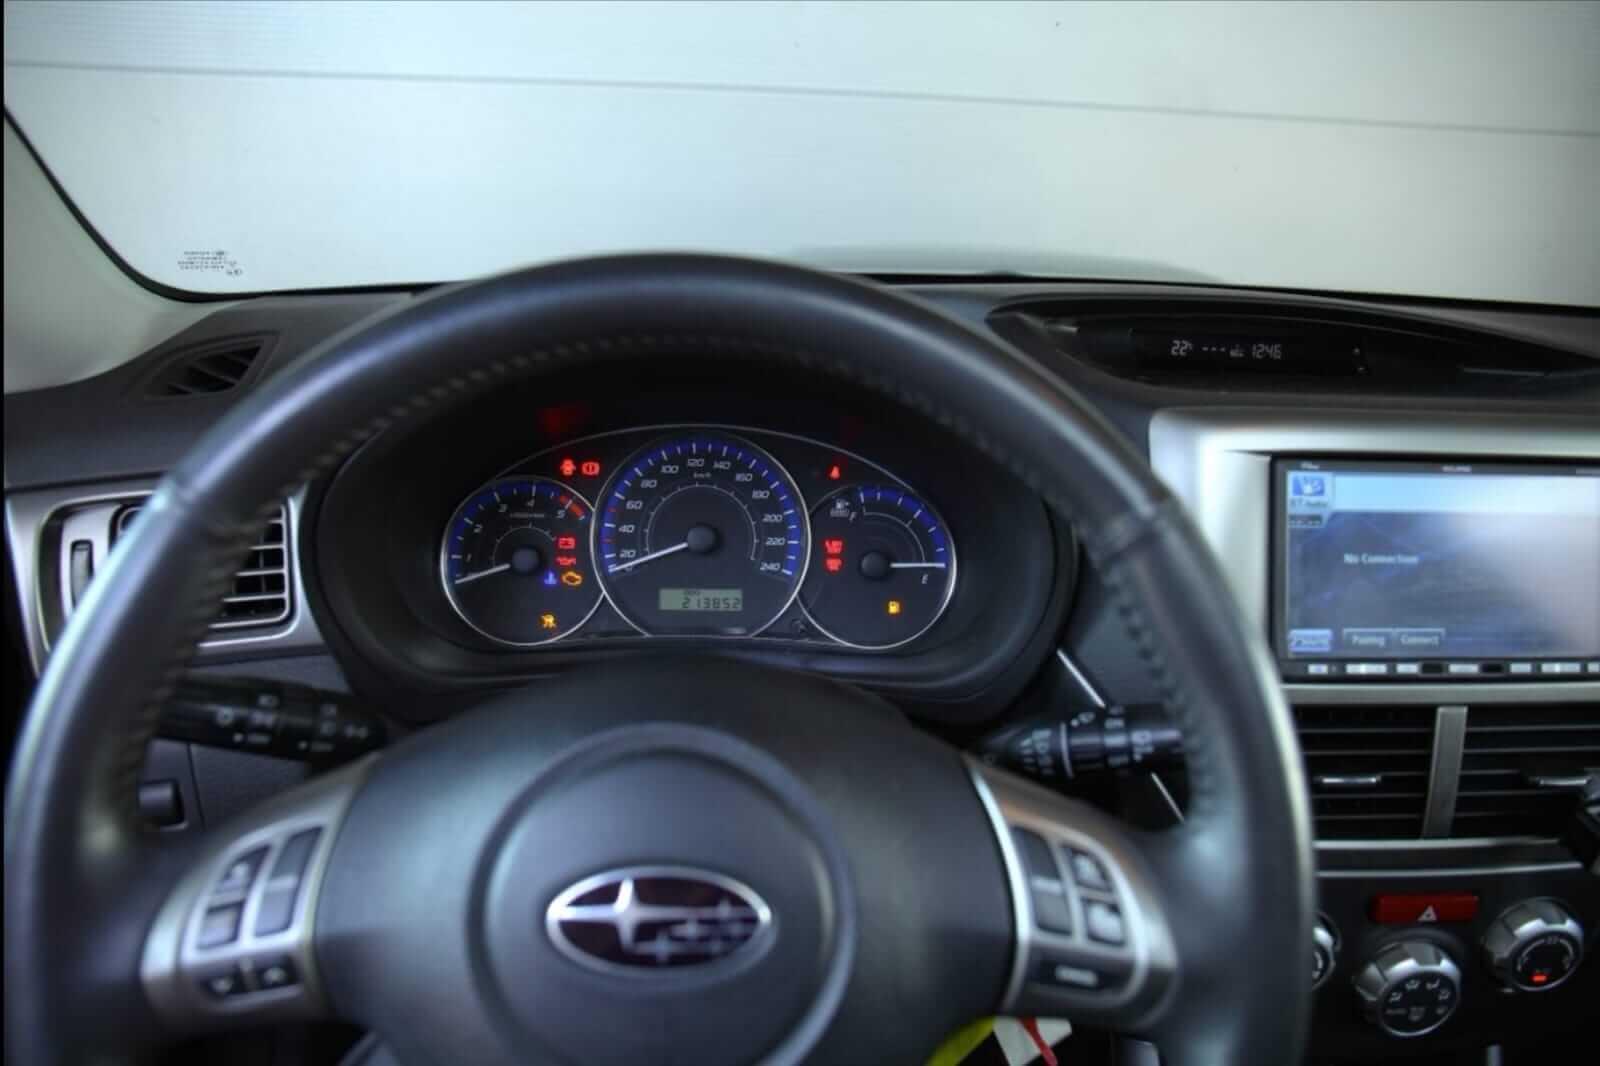 Subaru Forester dashboard – by Next Level Automotive – Go to nextlevelautomotive.eu